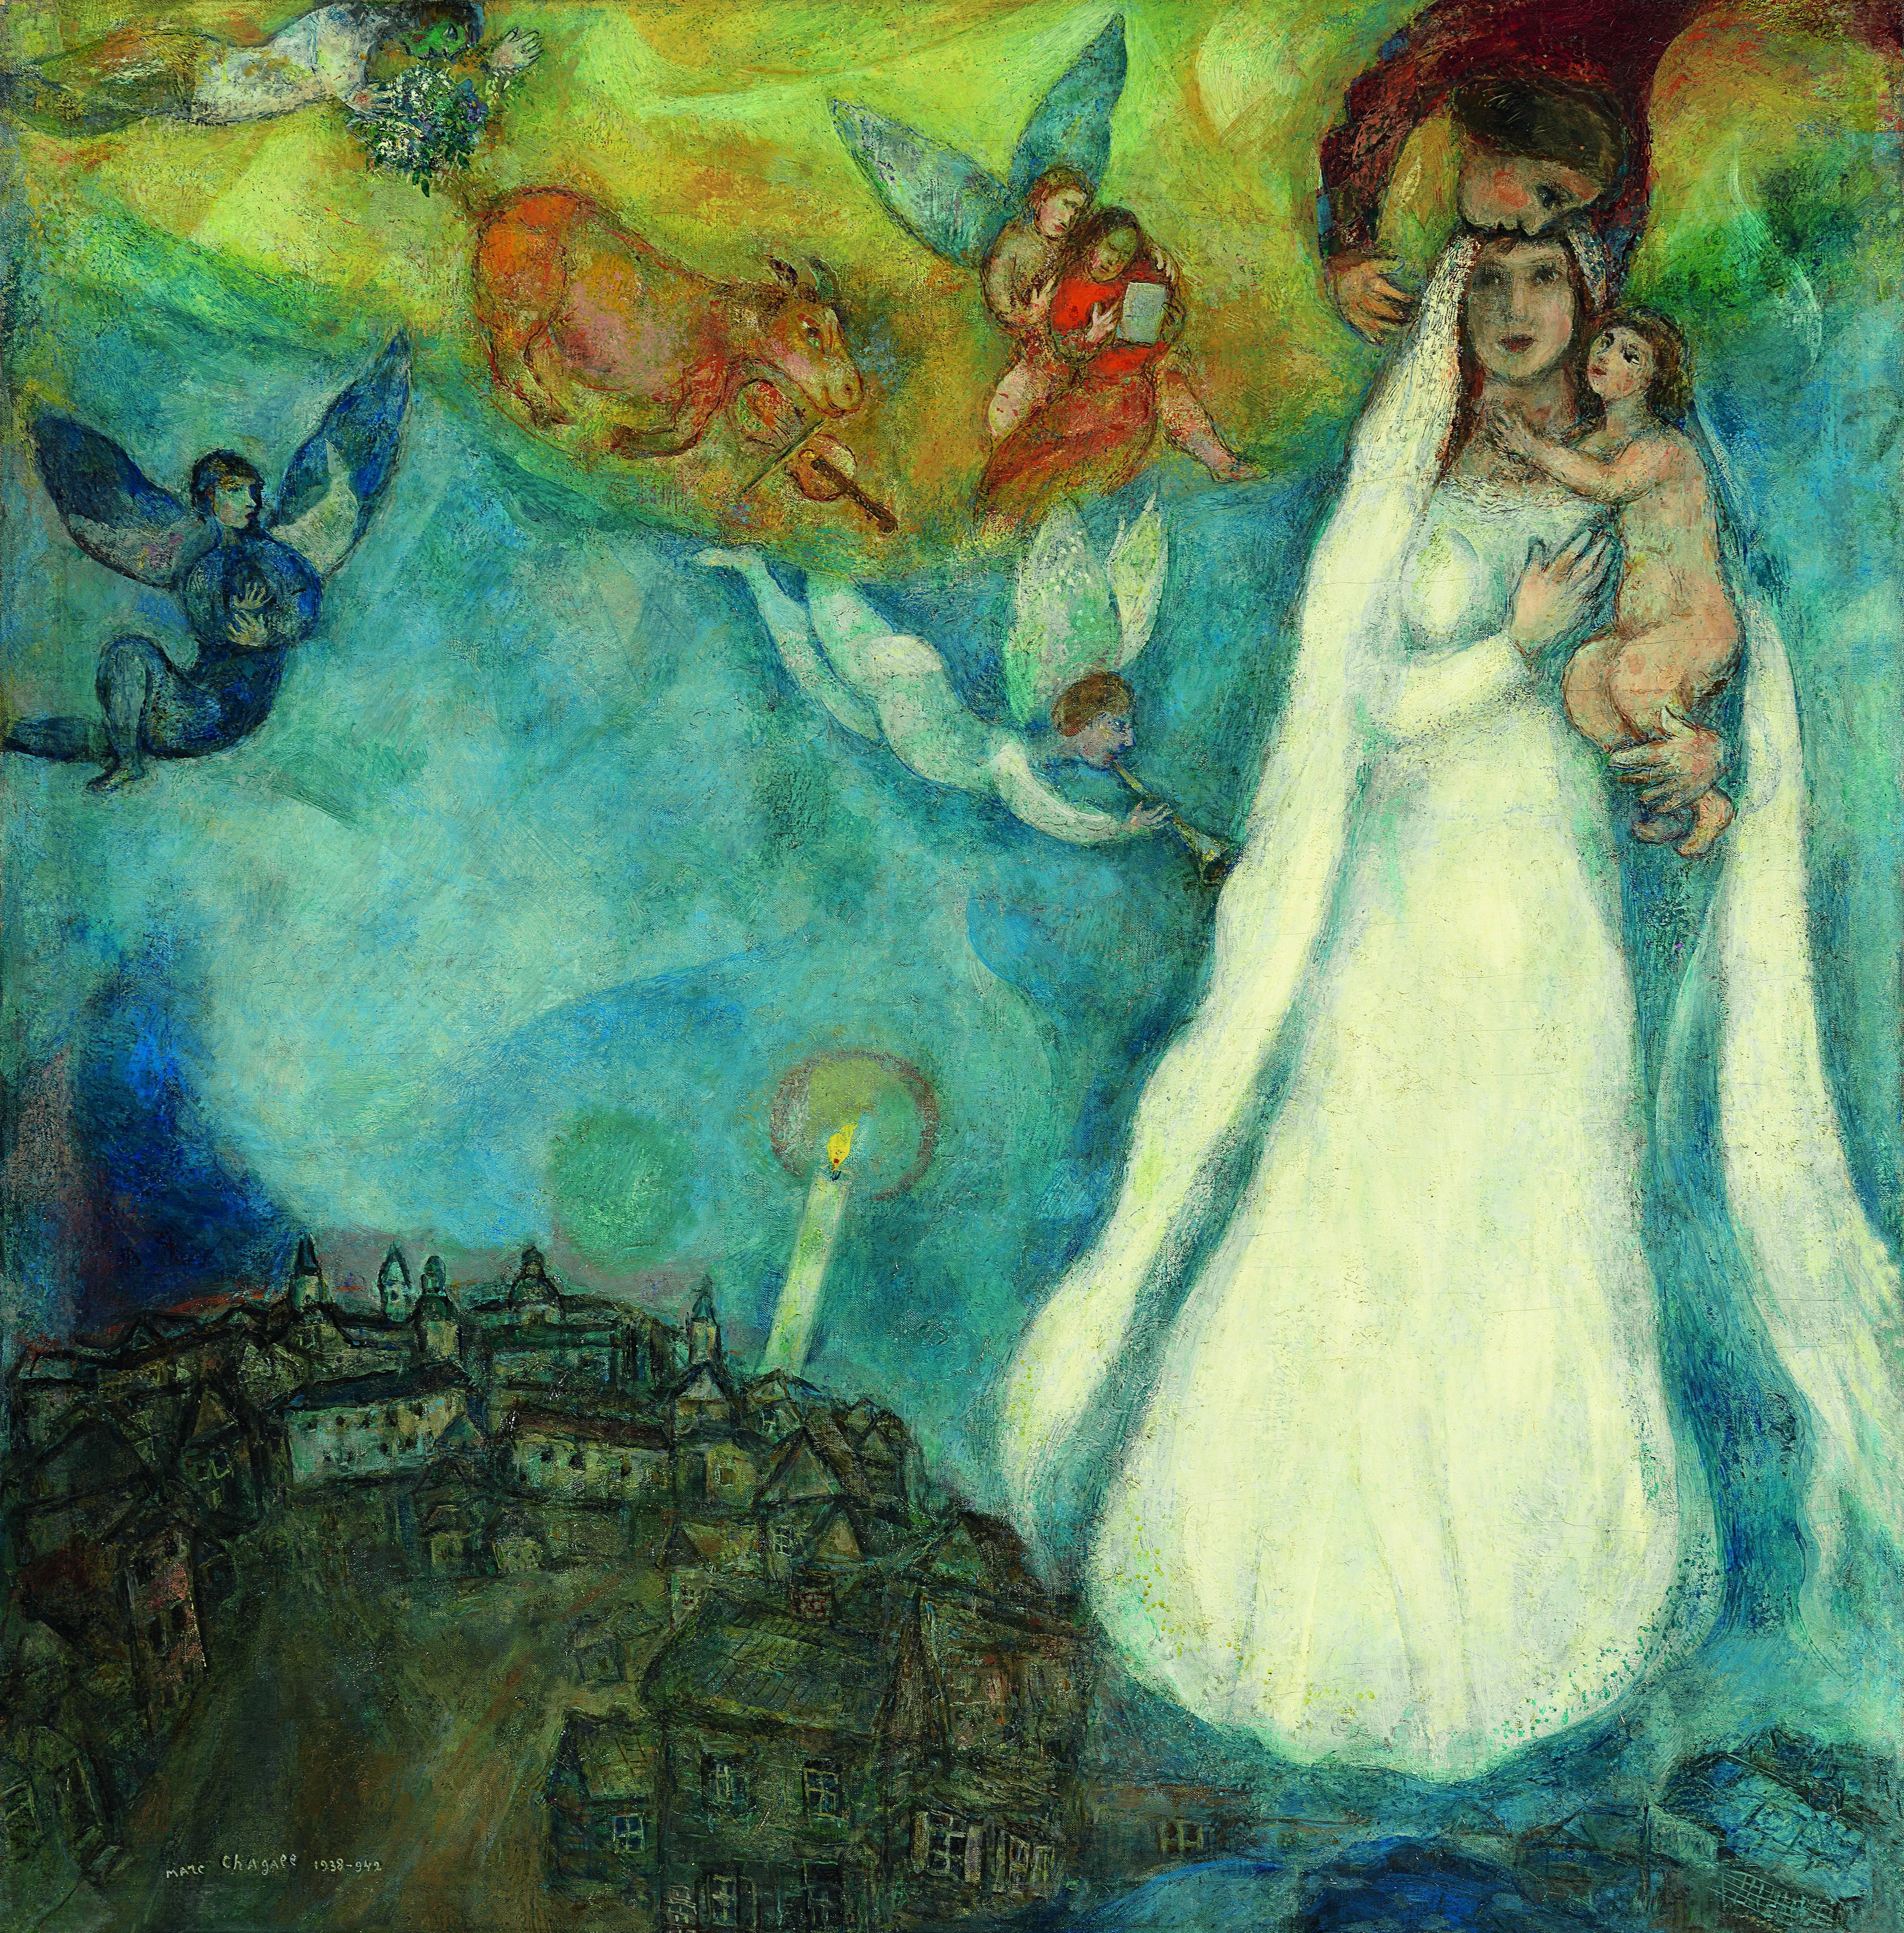 Marc Chagall La Virgen de la aldea 1938-1942 Óleo sobre lienzo. 102,5 x 98 cm Museo Thyssen-Bornemisza, Madrid © VEGAP, Barcelona, 2016 - Chagall ®